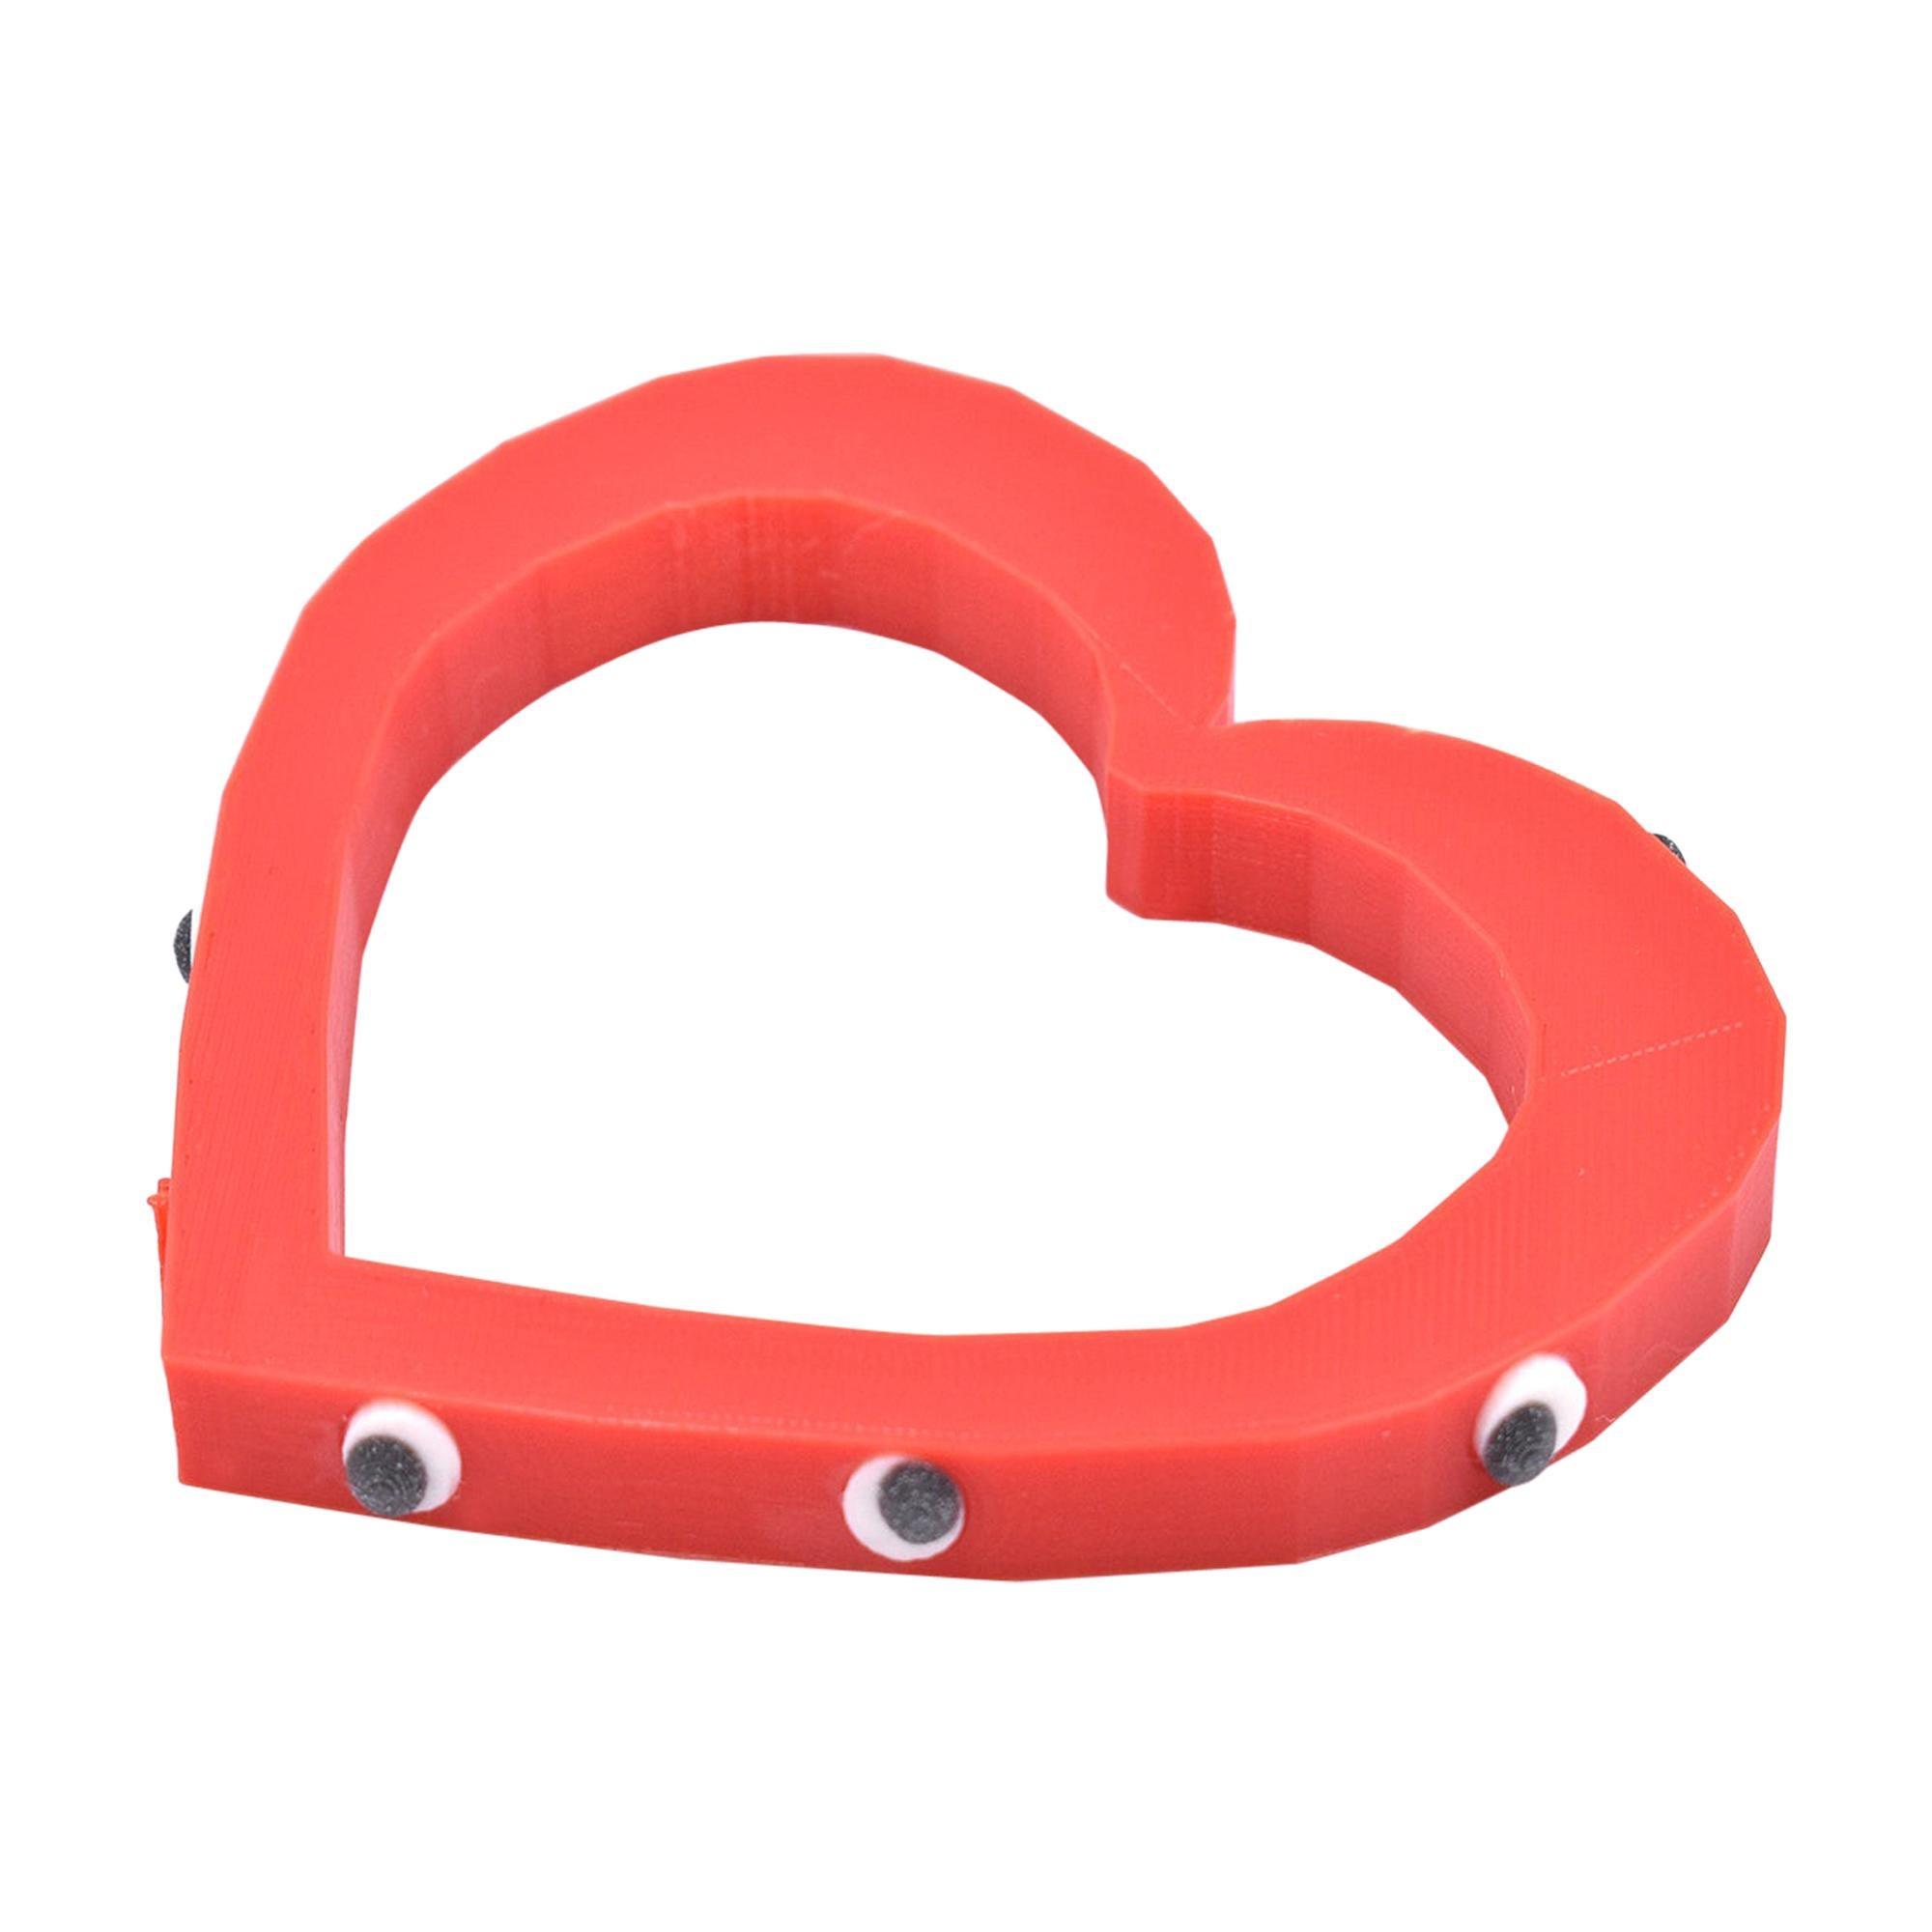 3d Printed Foolish Heart Bangle Red